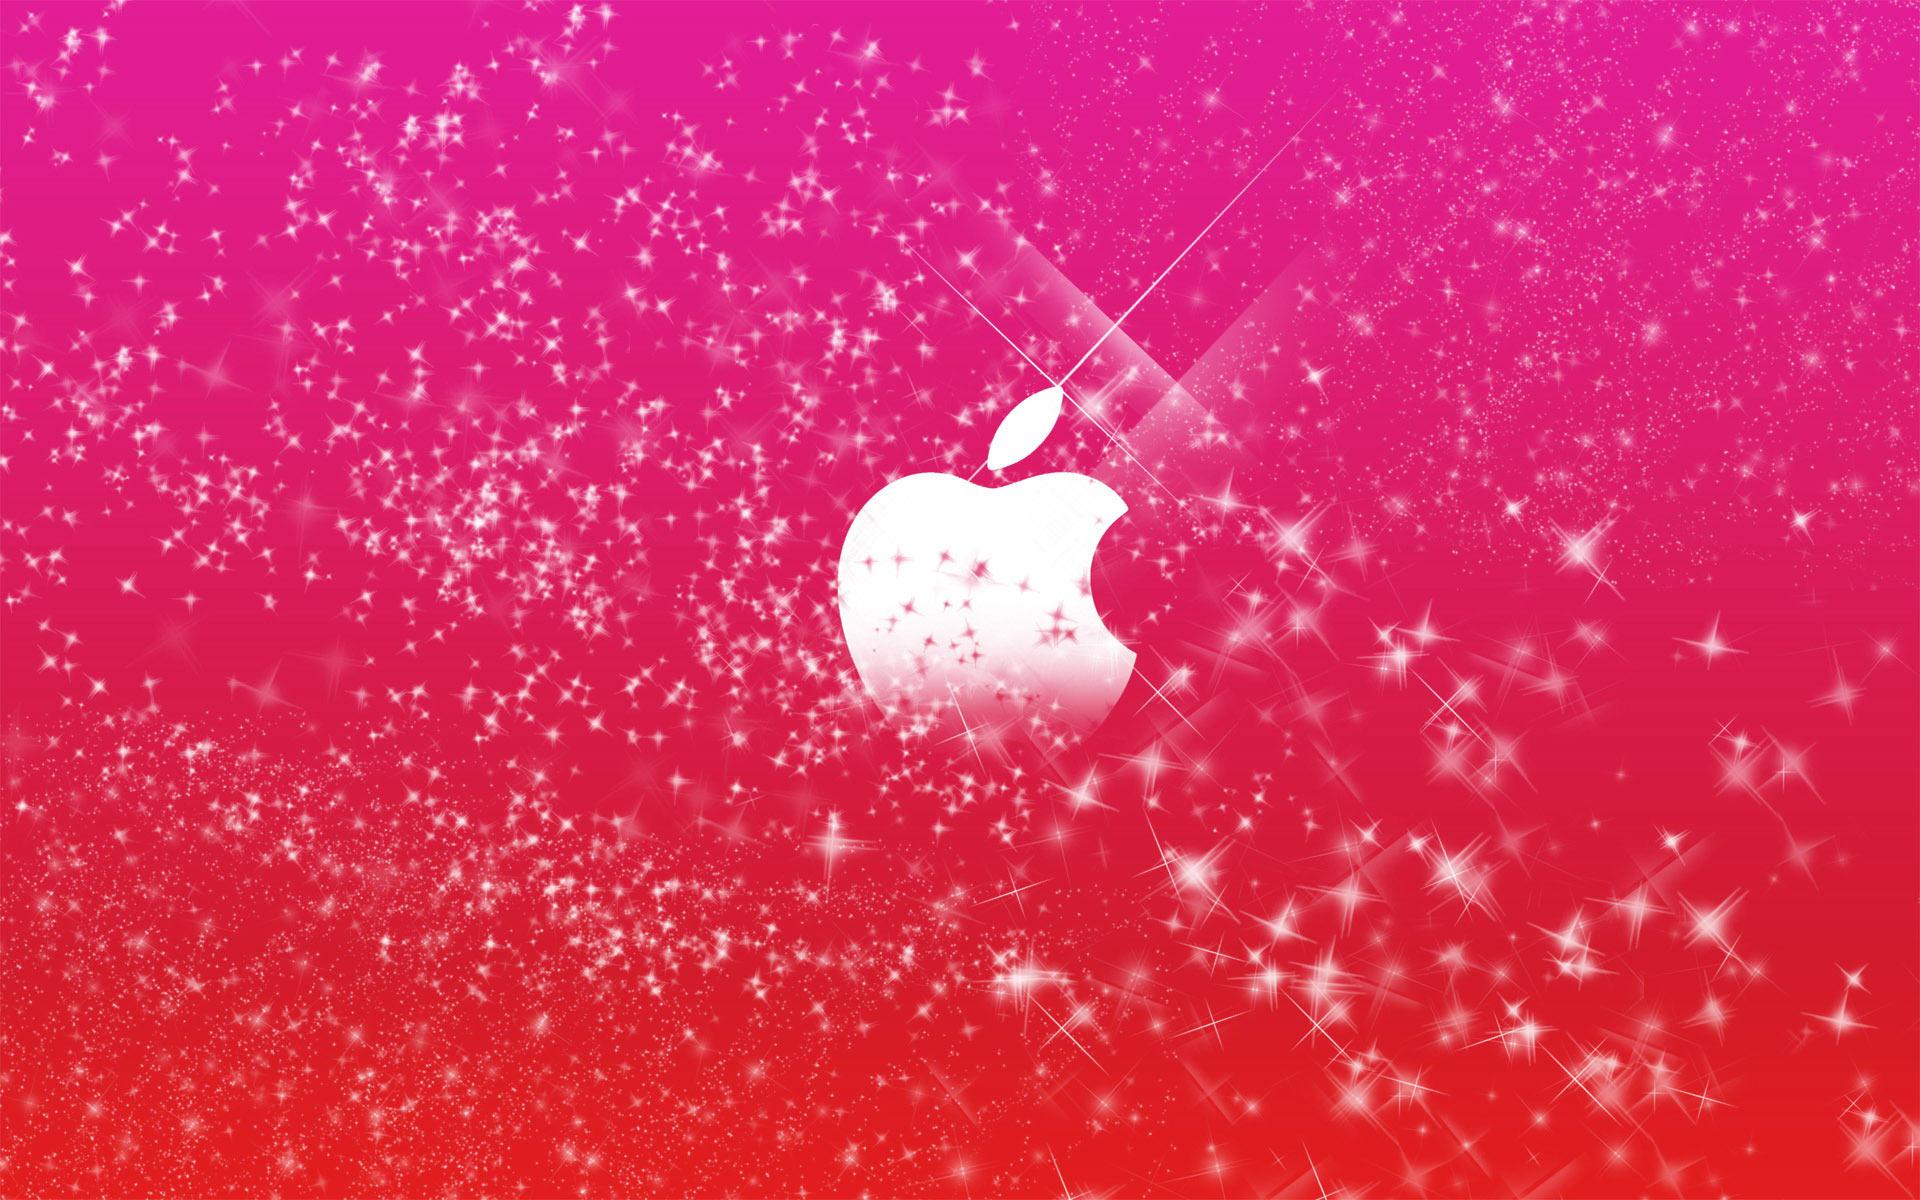 Pink Apple Logo 1920x1200